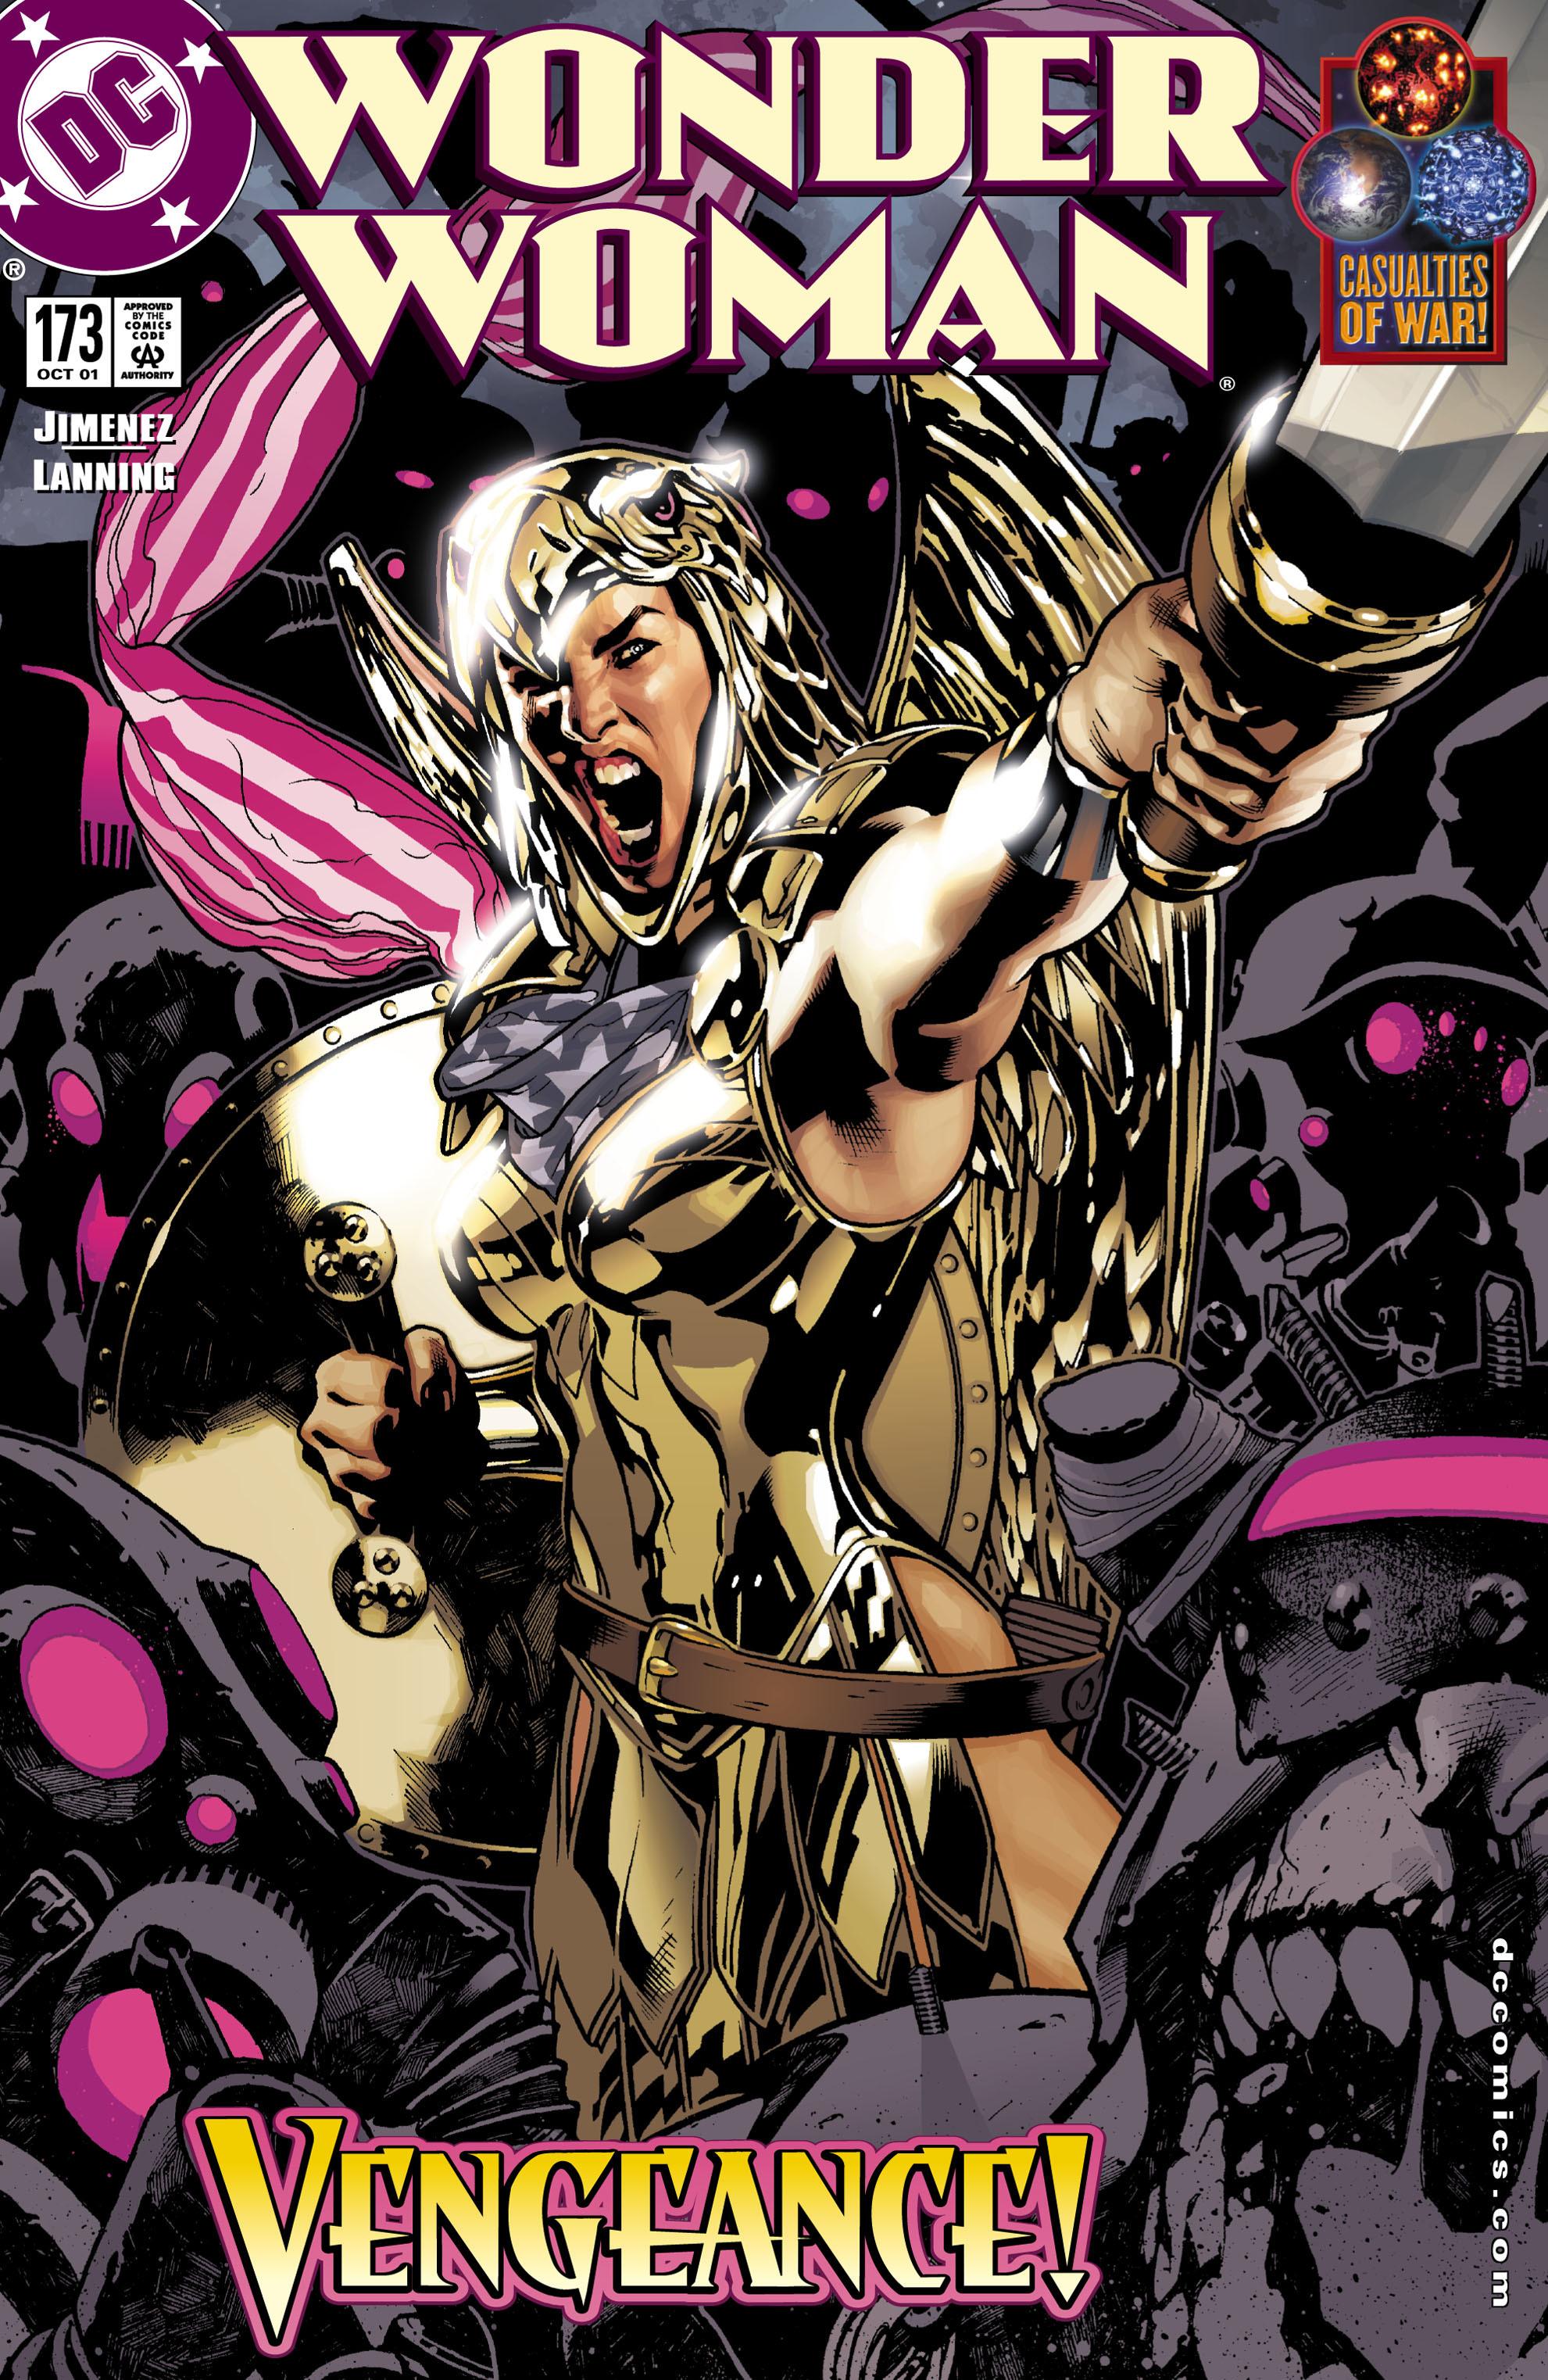 Read online Wonder Woman (1987) comic -  Issue #173 - 1